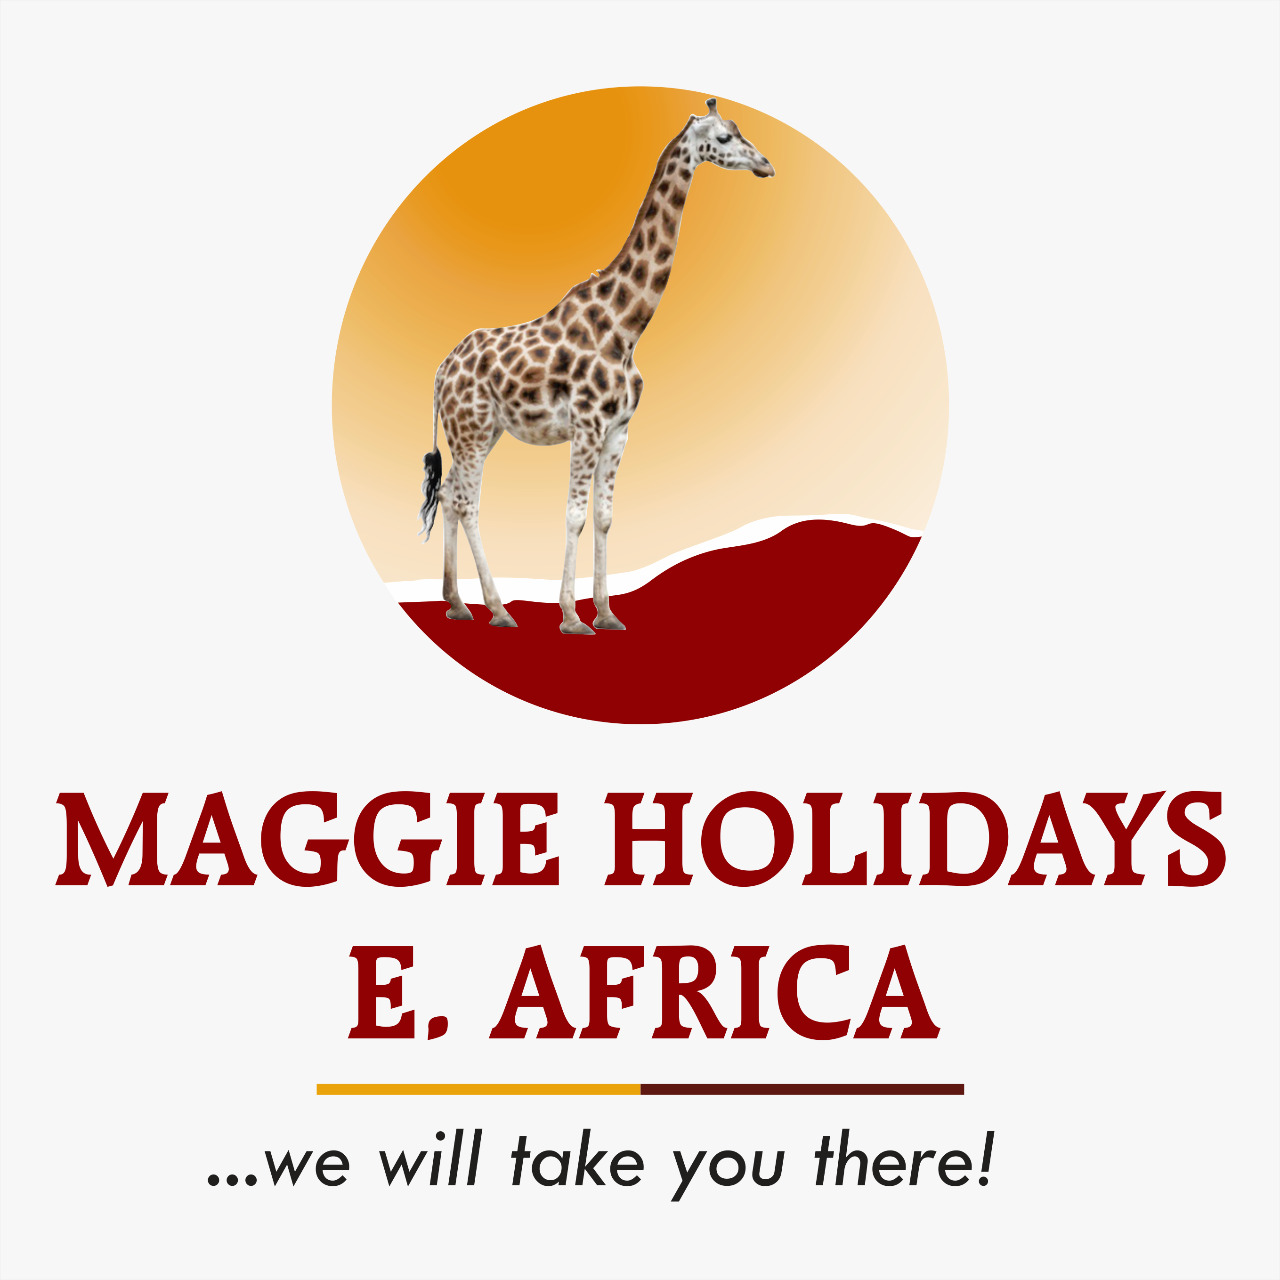 Maggie Holidays East Africa Ltd